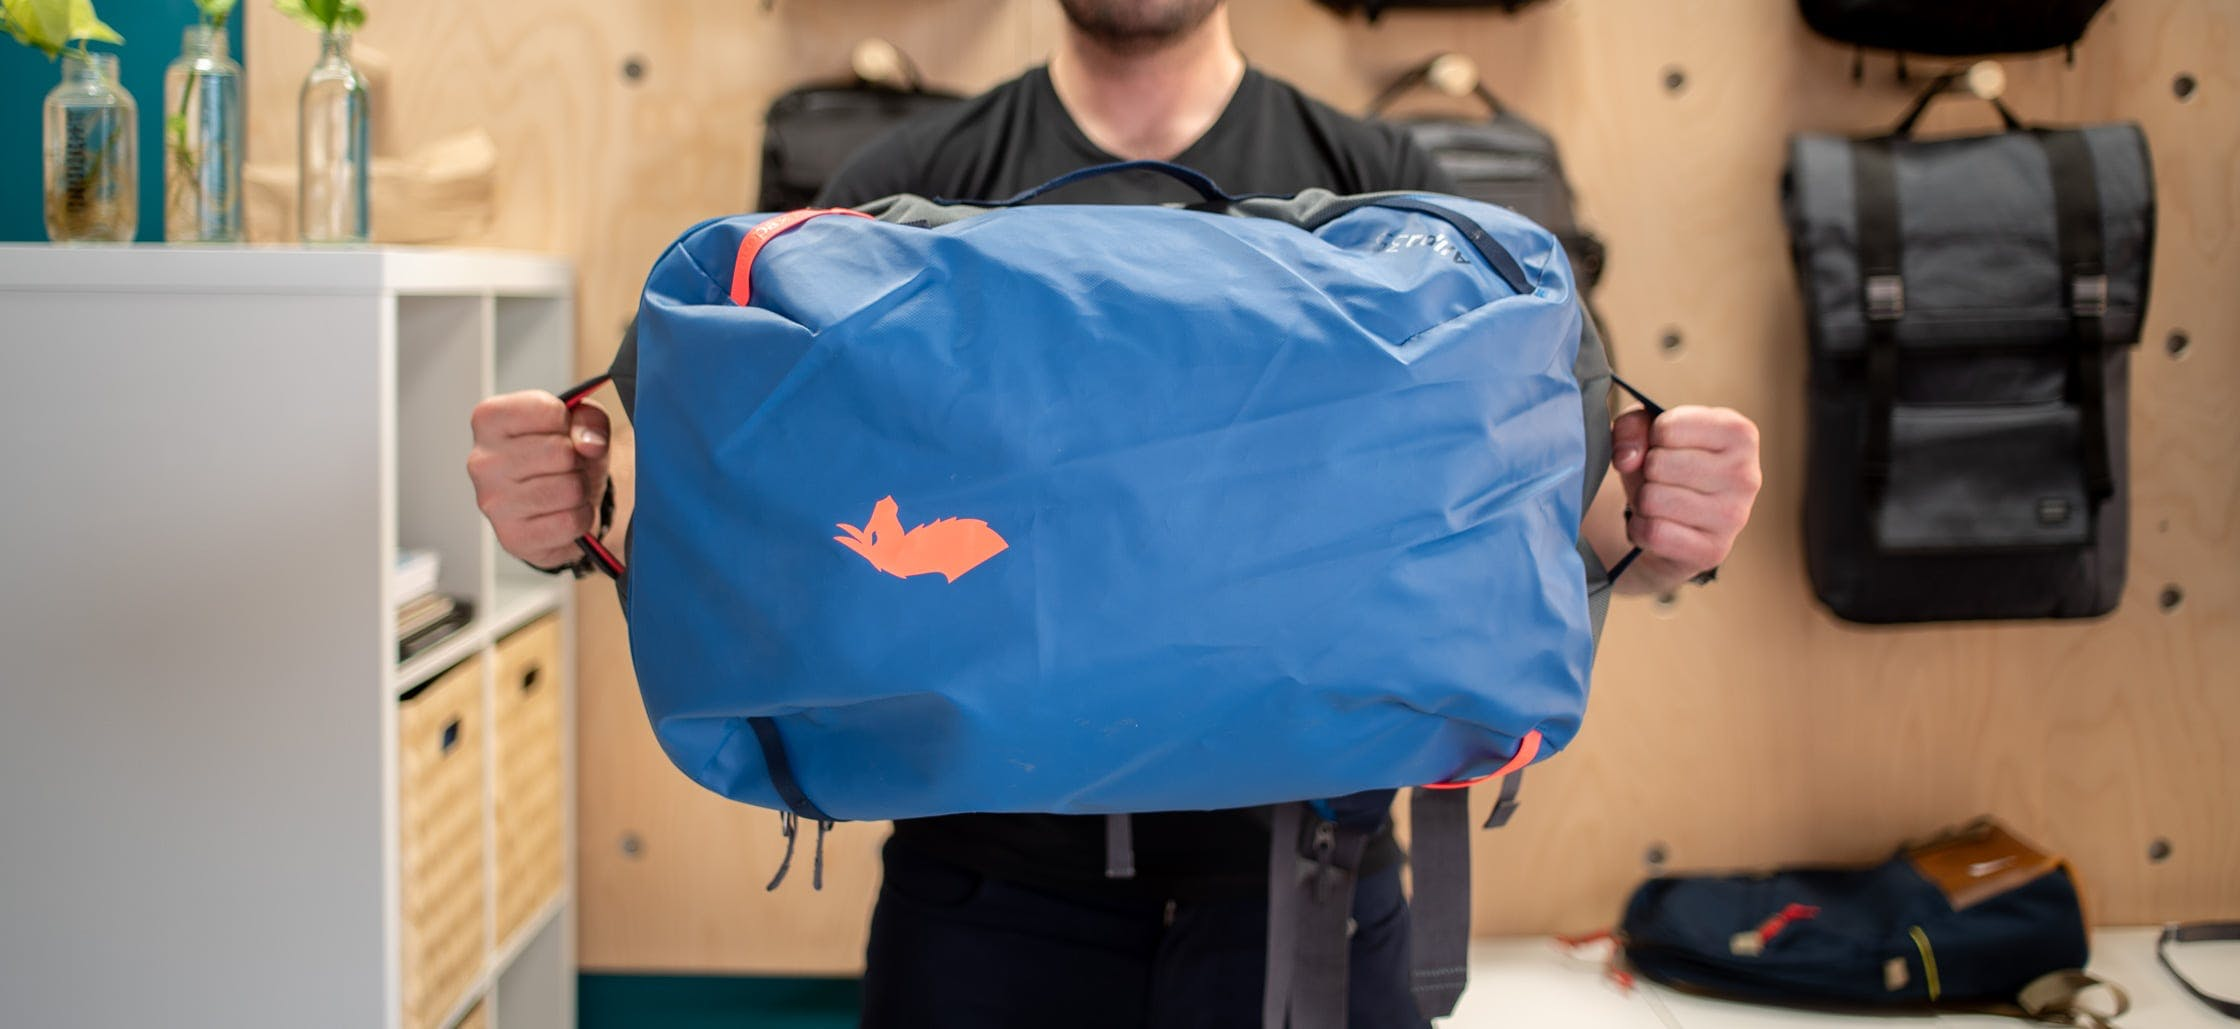 Cotopaxi Allpa Easy-To-Grab Handles